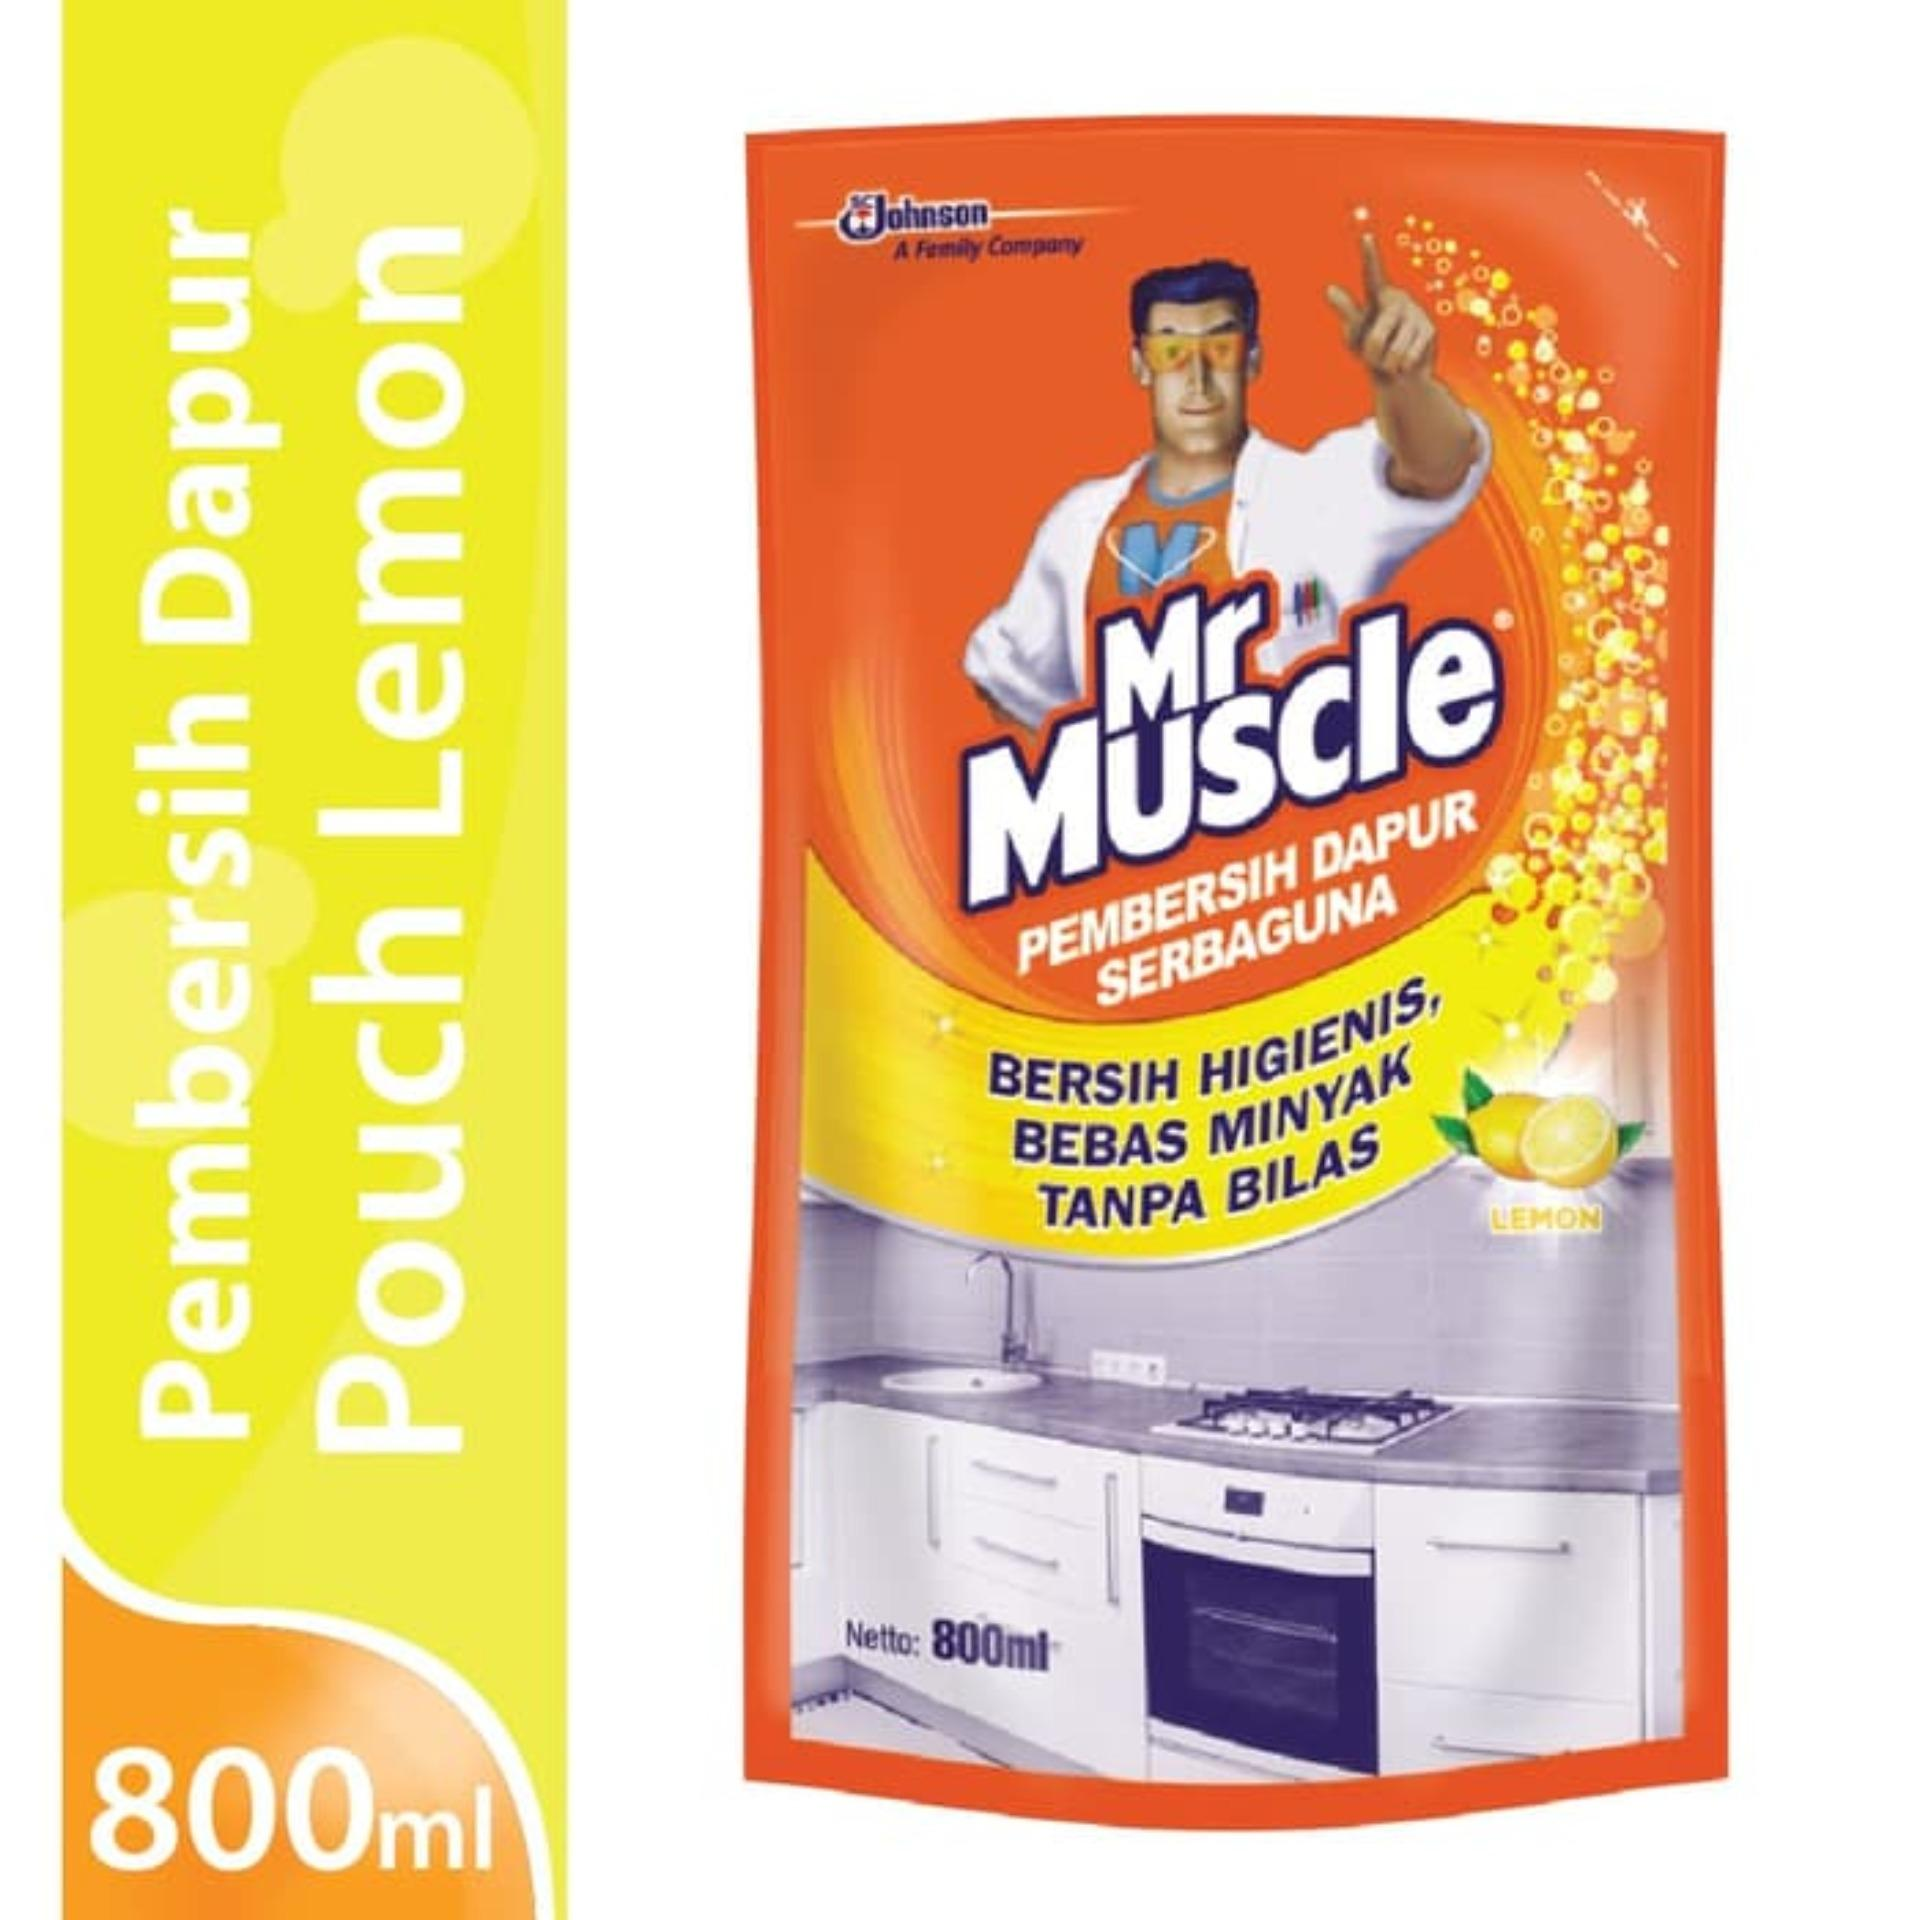 Mr. Muscle Kitchen Lemon Pouch 800ml By Sc Johnson & Son Id.